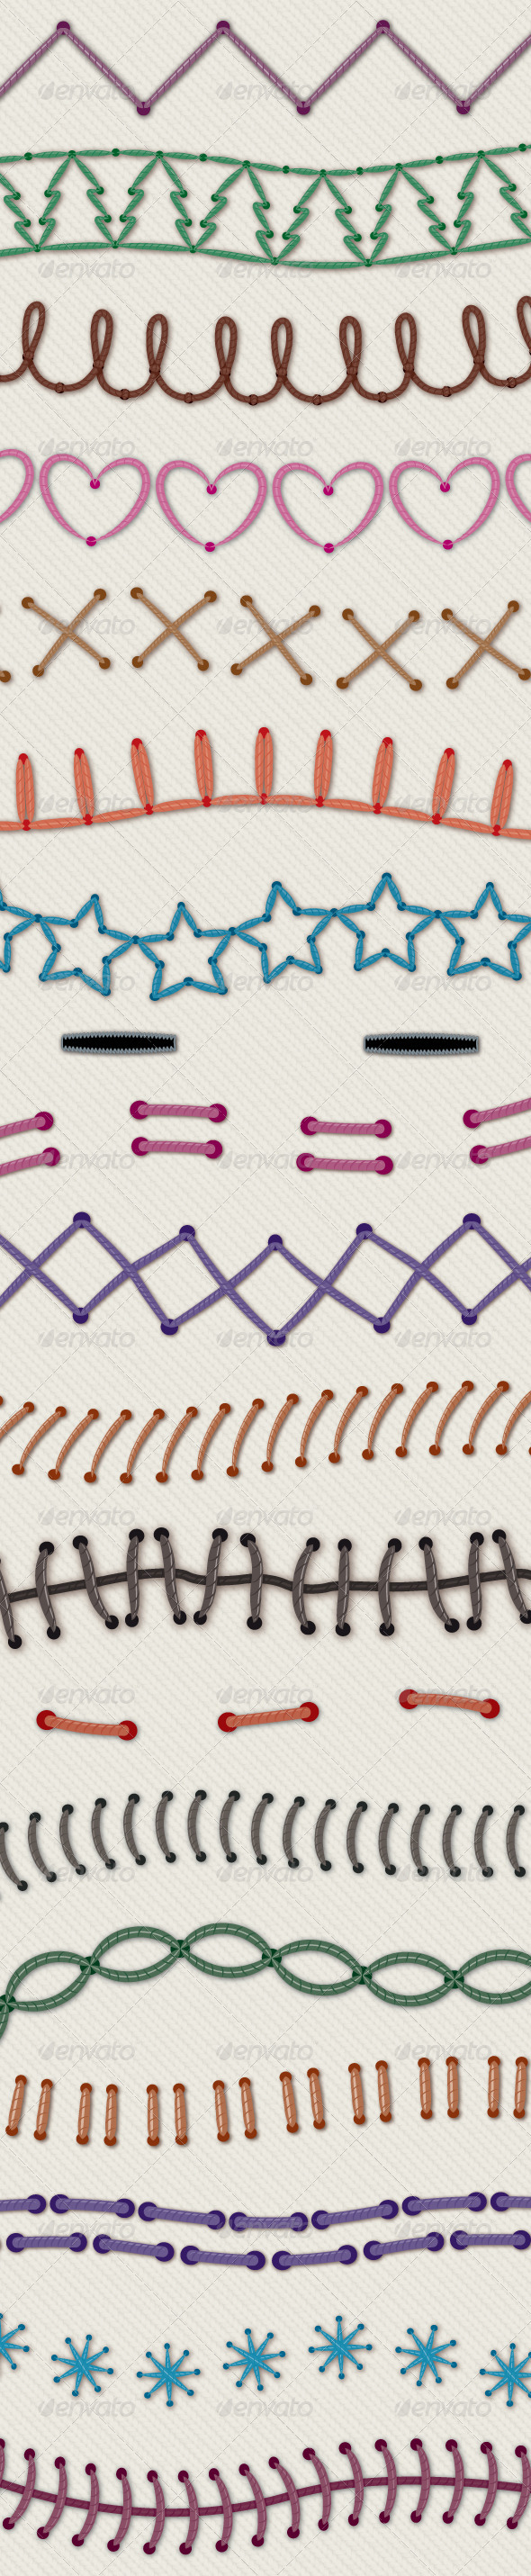 Novelty Illustrator Stitch Brushes